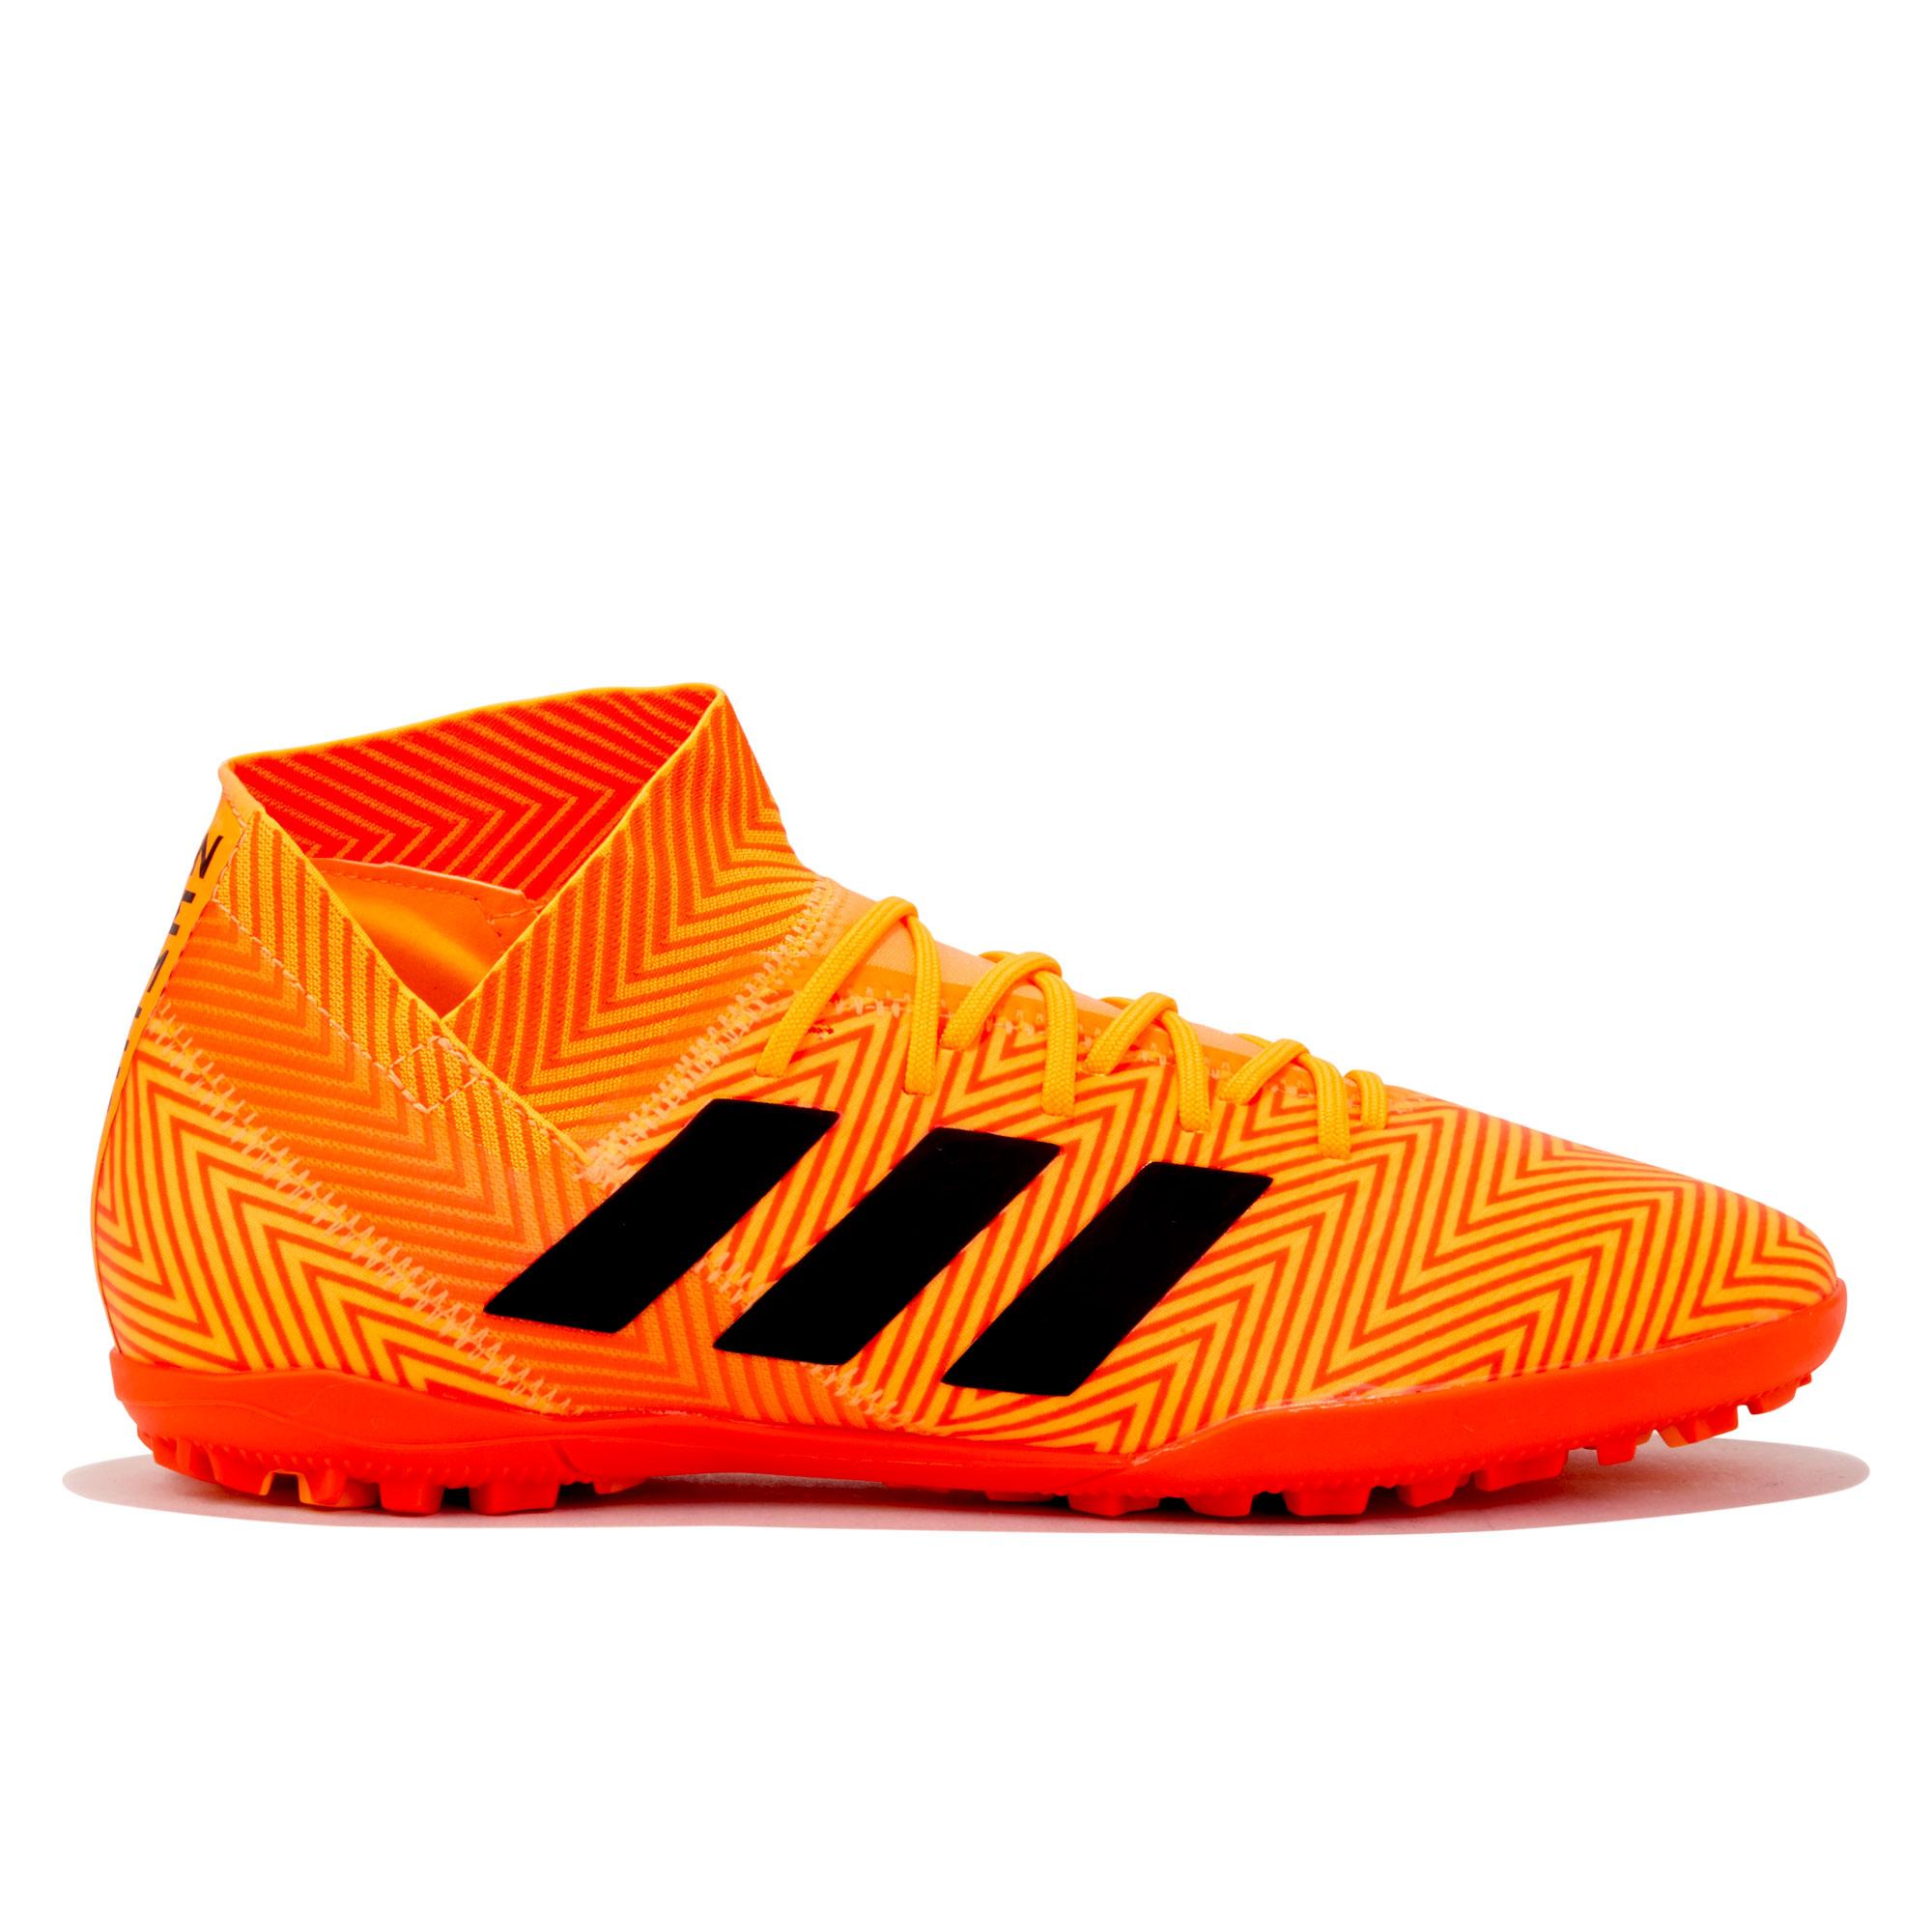 Image of adidas Nemeziz Tango 18.3 Astroturf Trainers - Orange